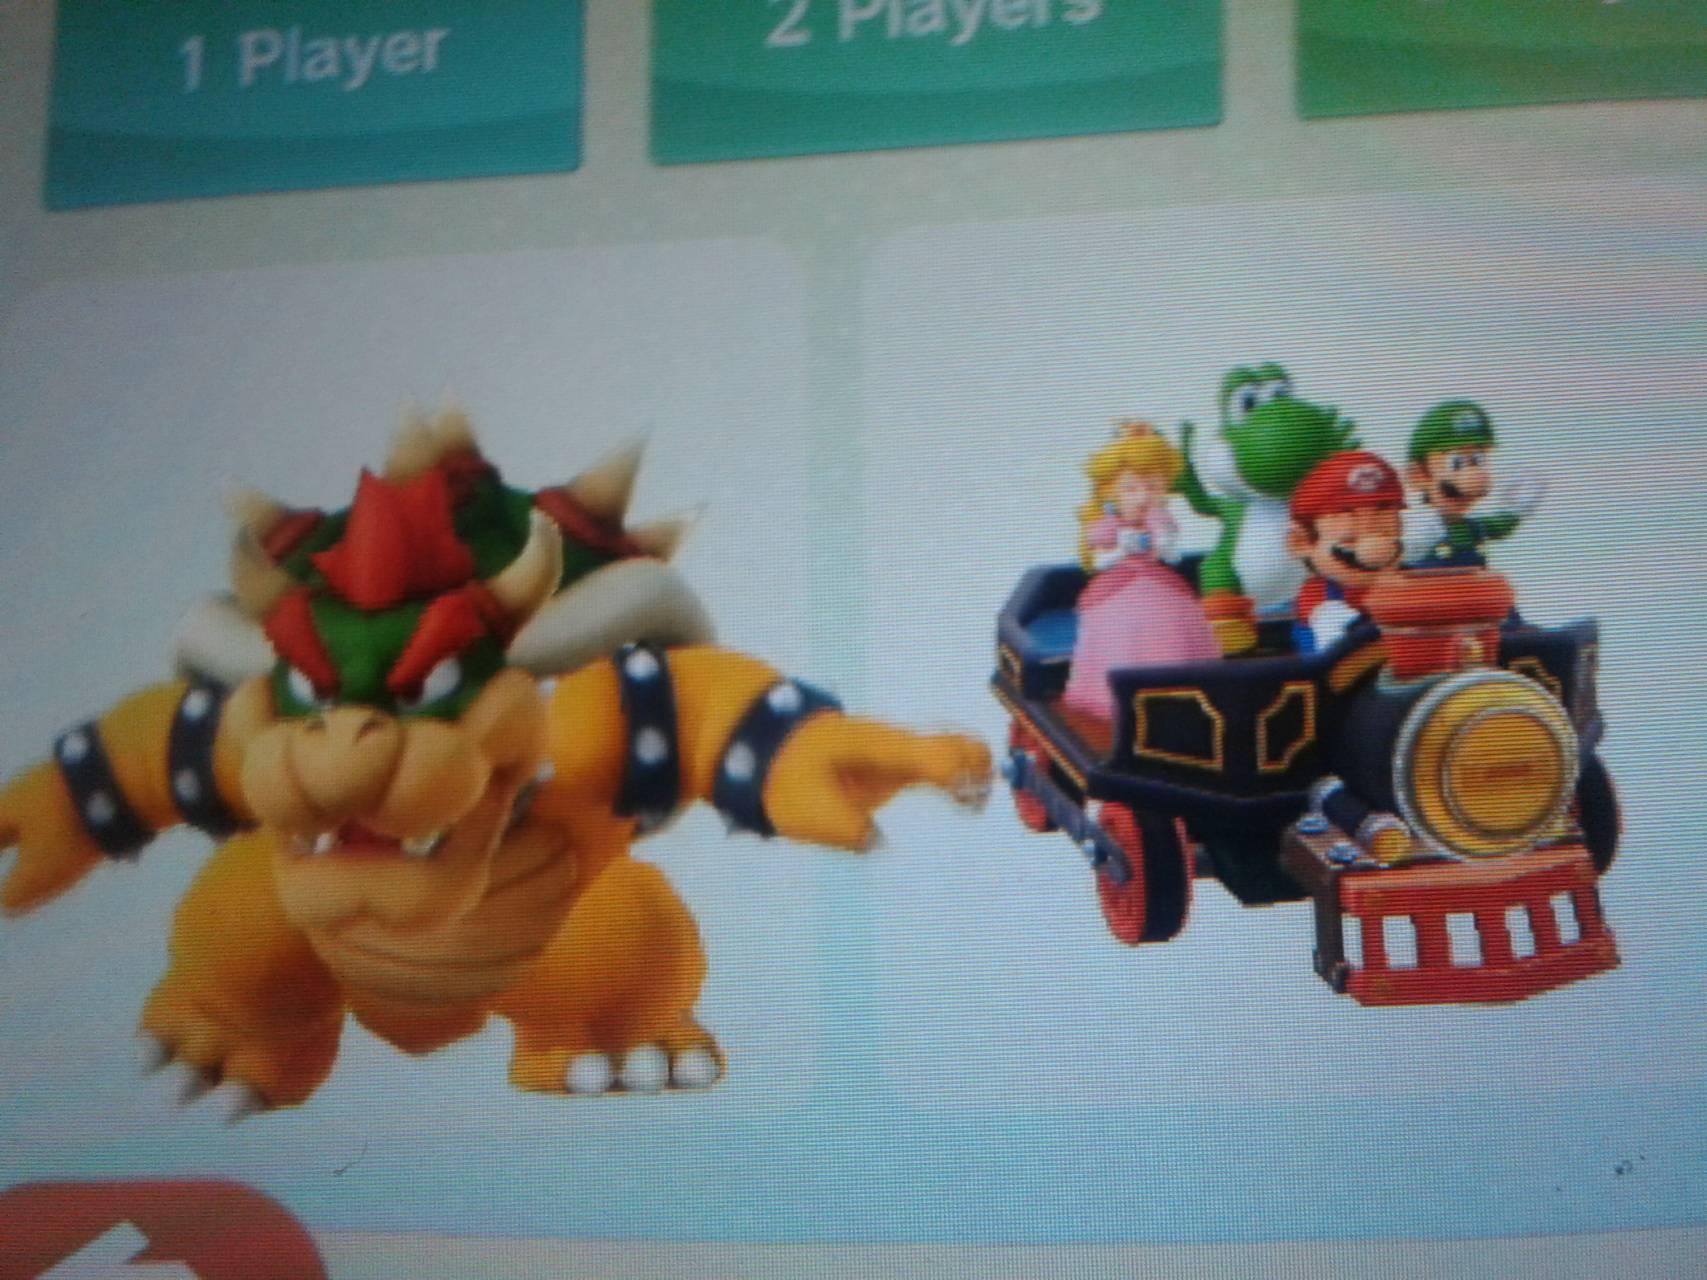 Mario team vs bowser